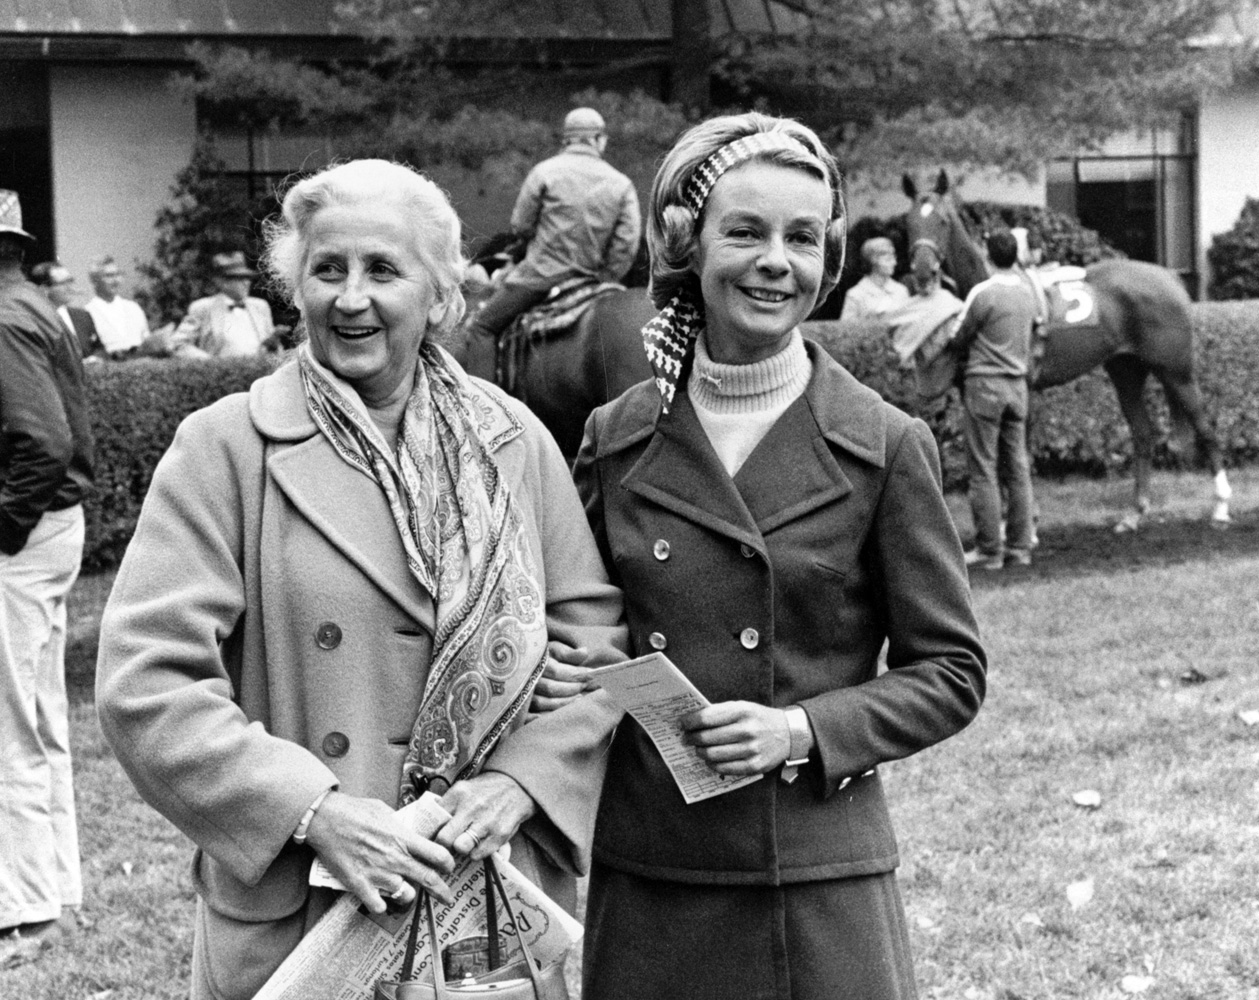 Mrs. John Wesley Mars and Alice Headley Bell in the paddock at Keeneland, 1969 (Keeneland Association)